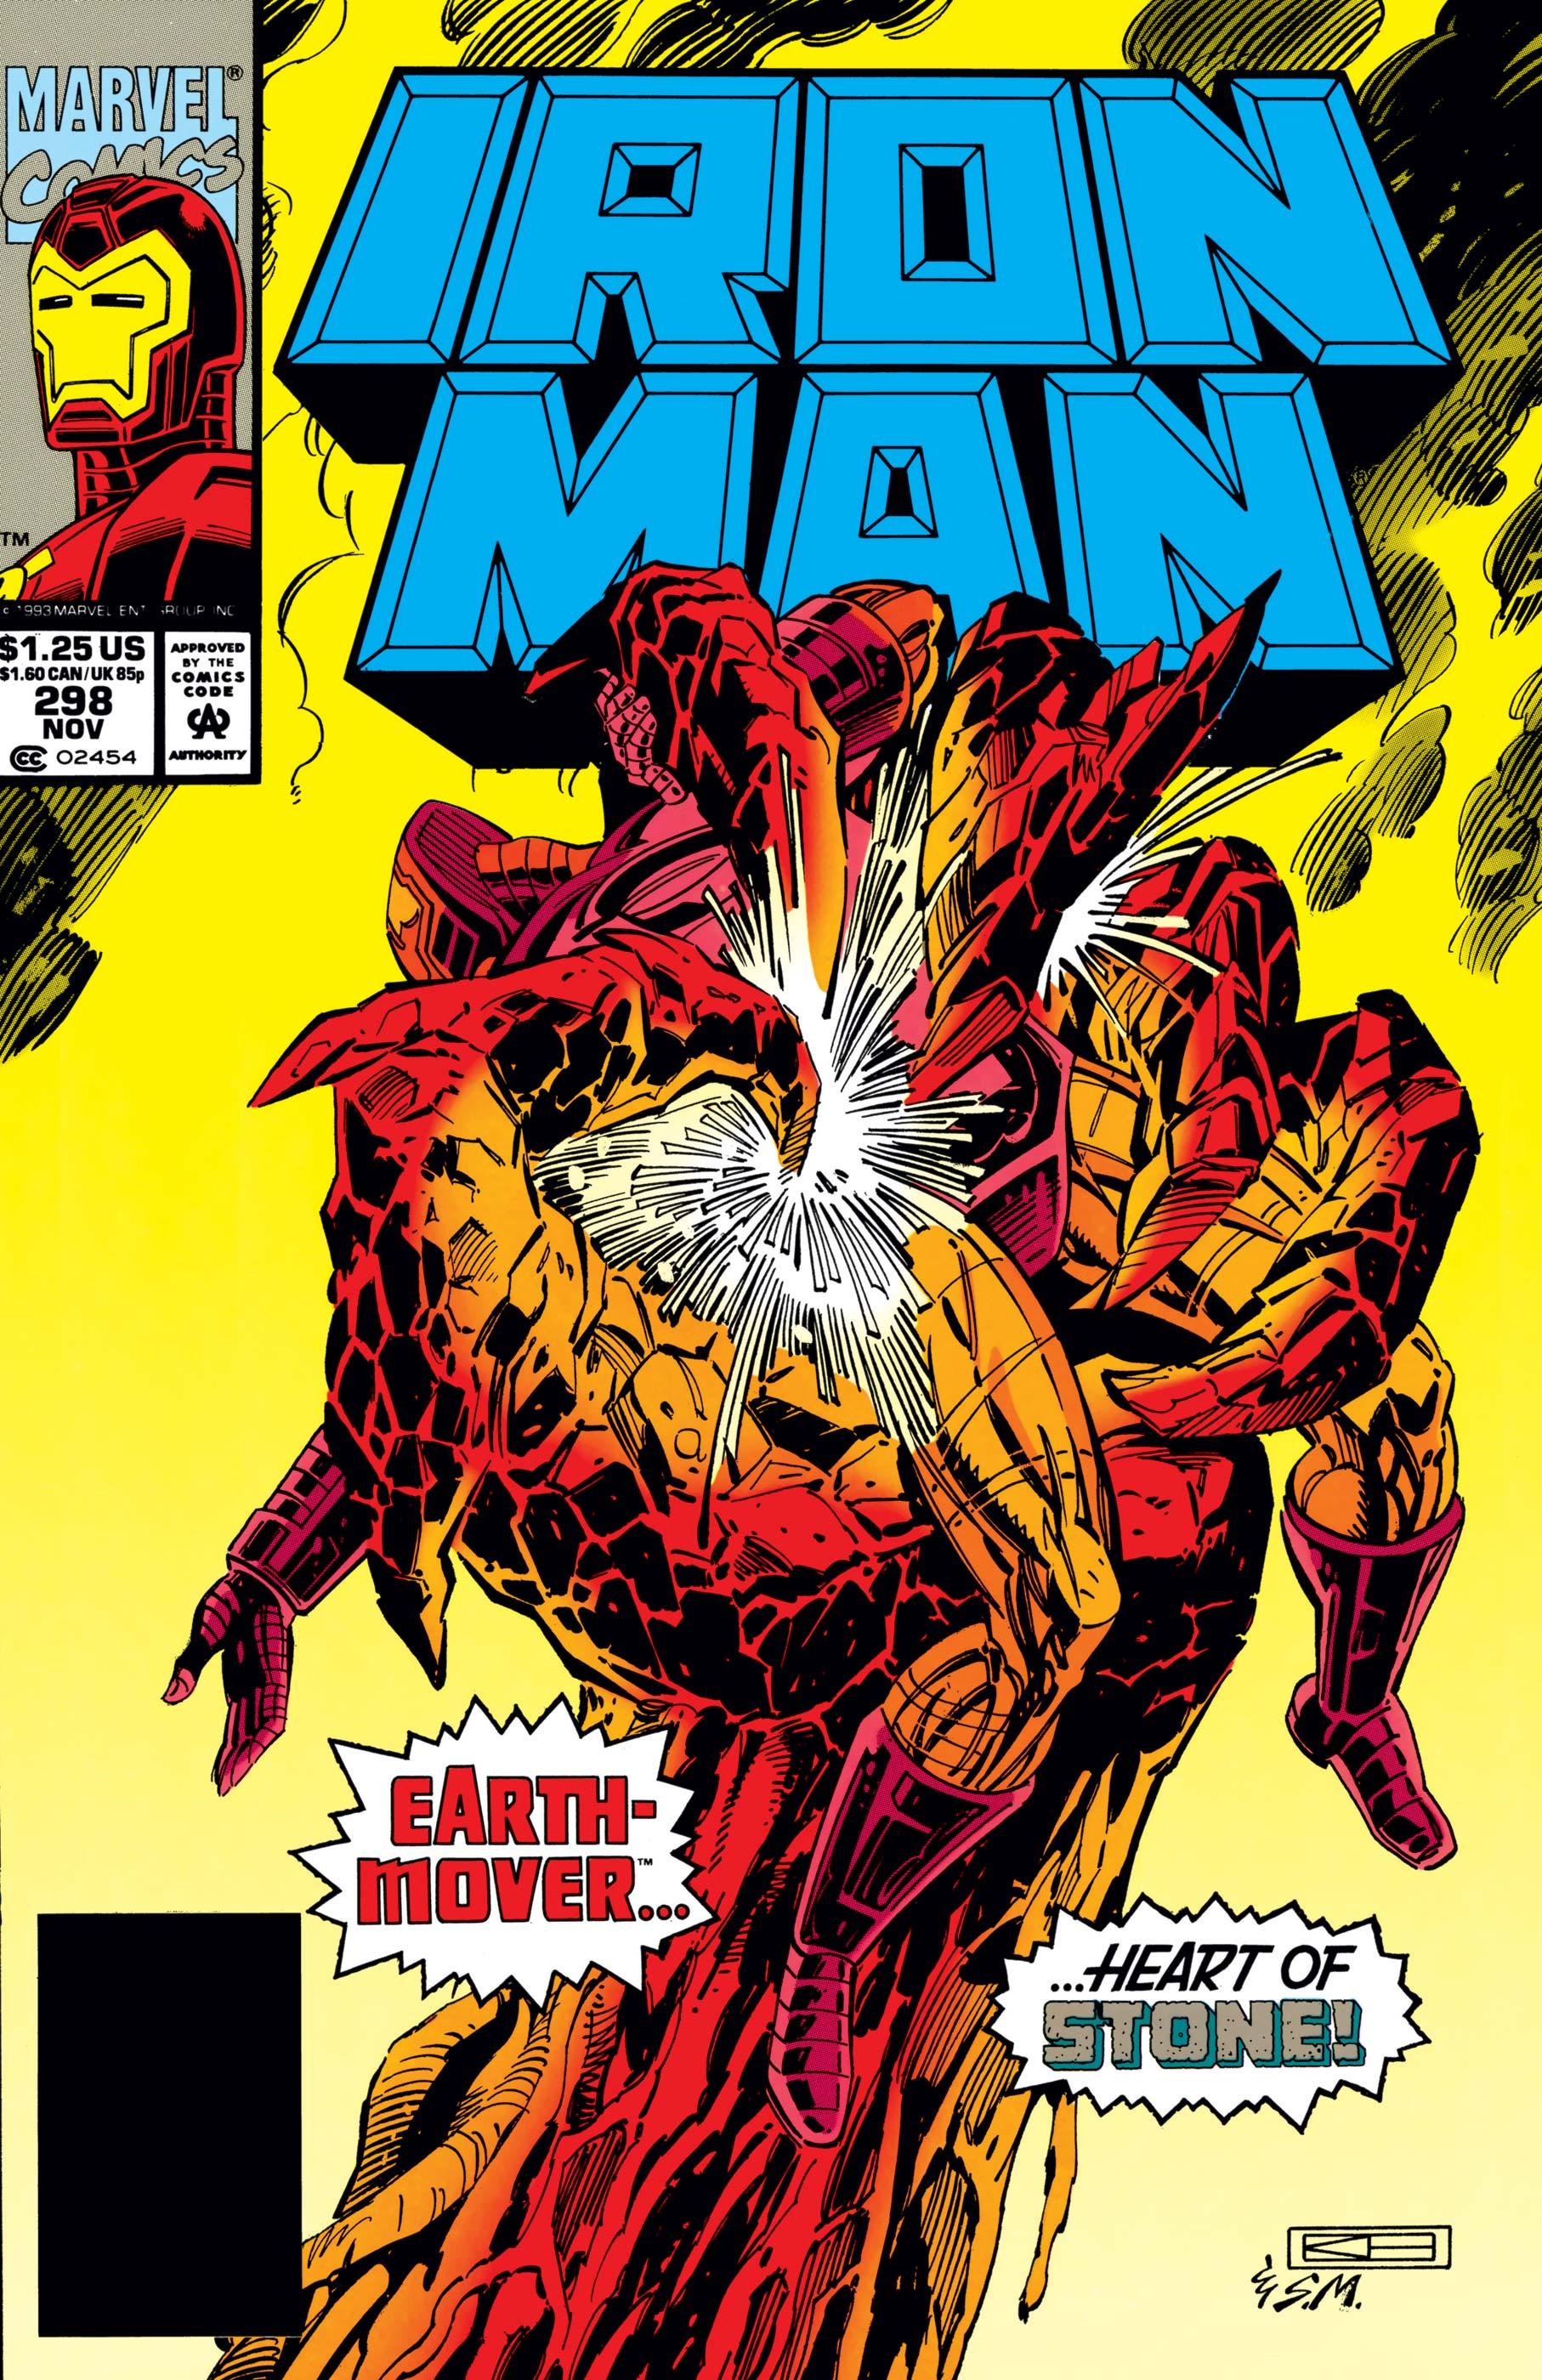 Iron Man (1968) #298